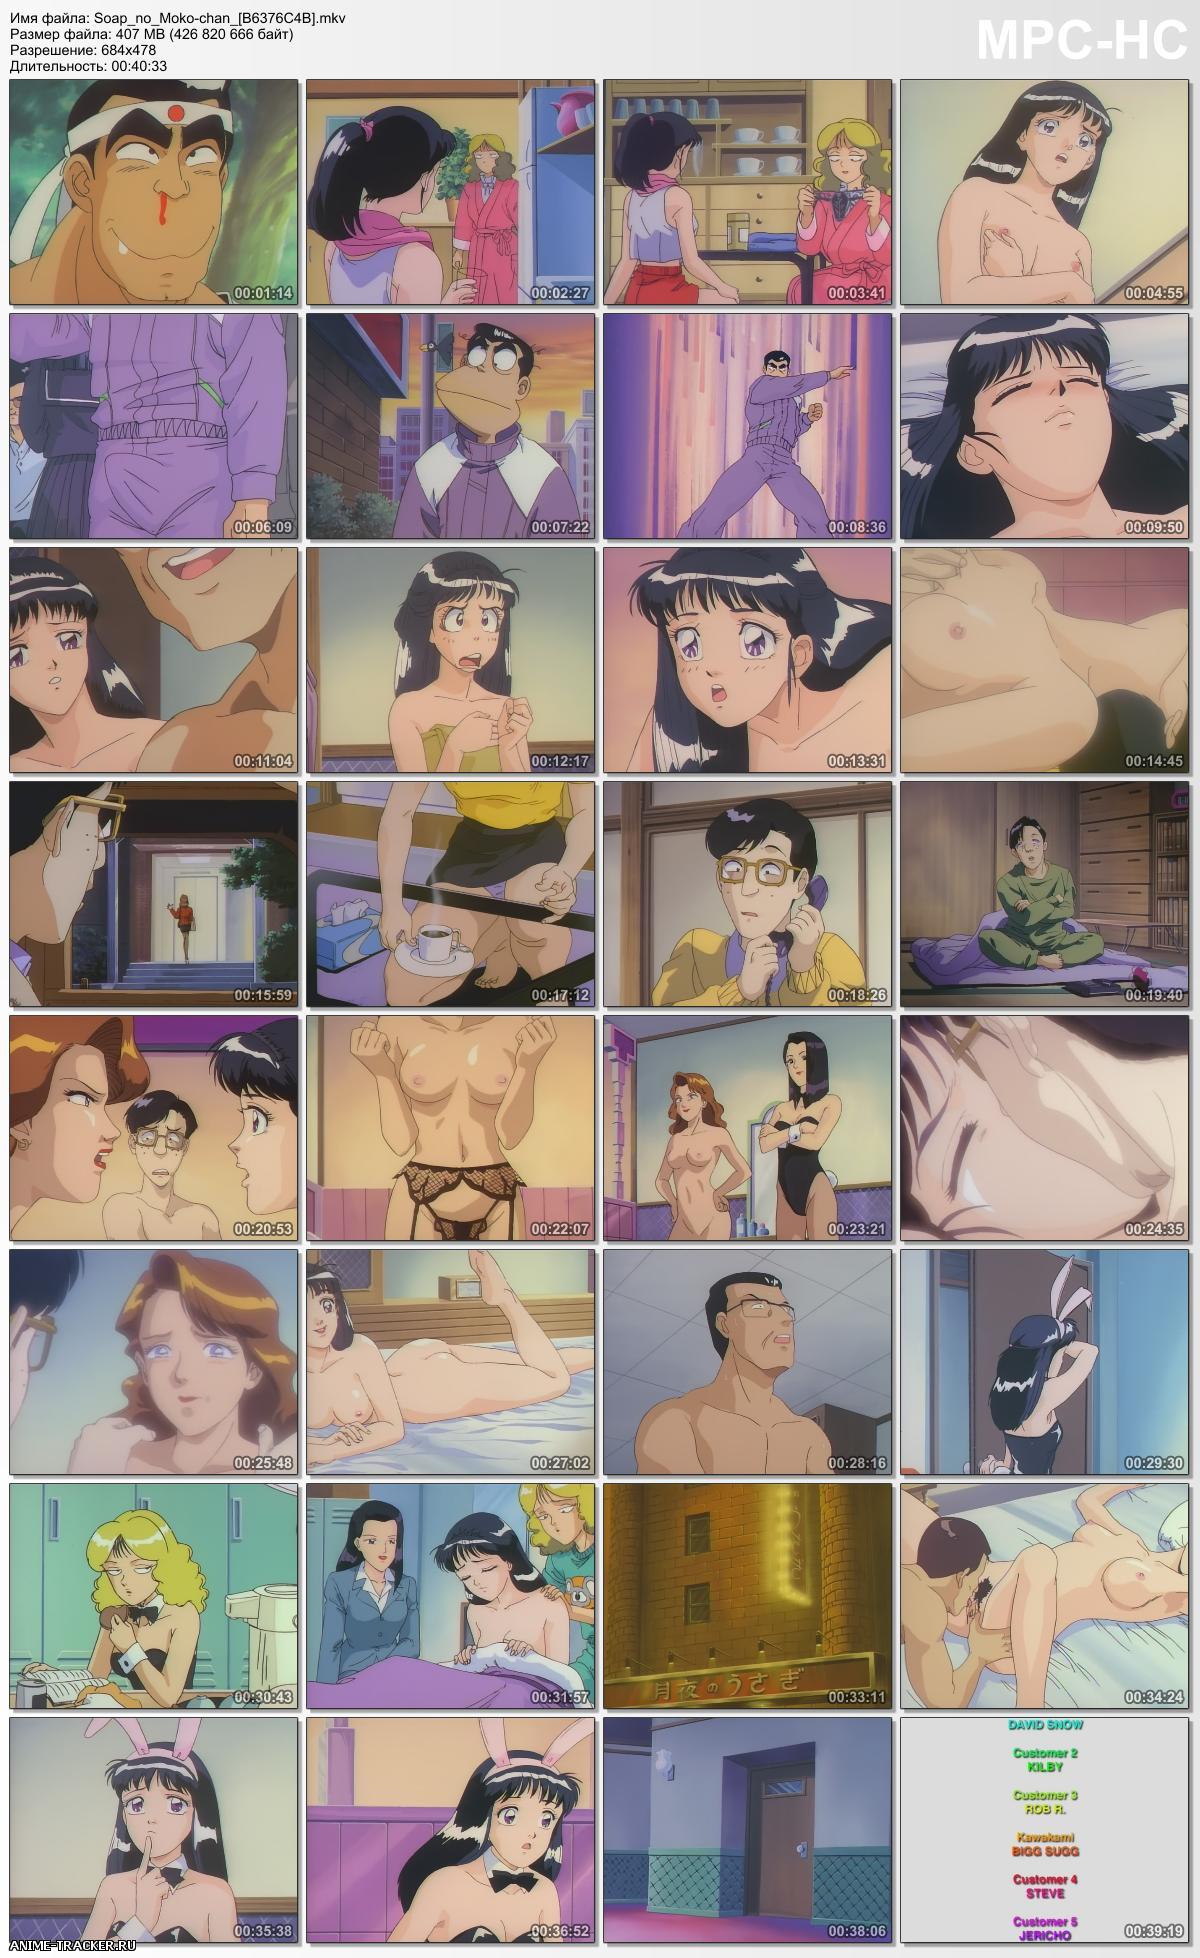 My Fair Masseuse / Soap no Moko-chan / Моя прекрасная массажистка [1 из 1] [RUS,ENG,JAP] Anime Hentai